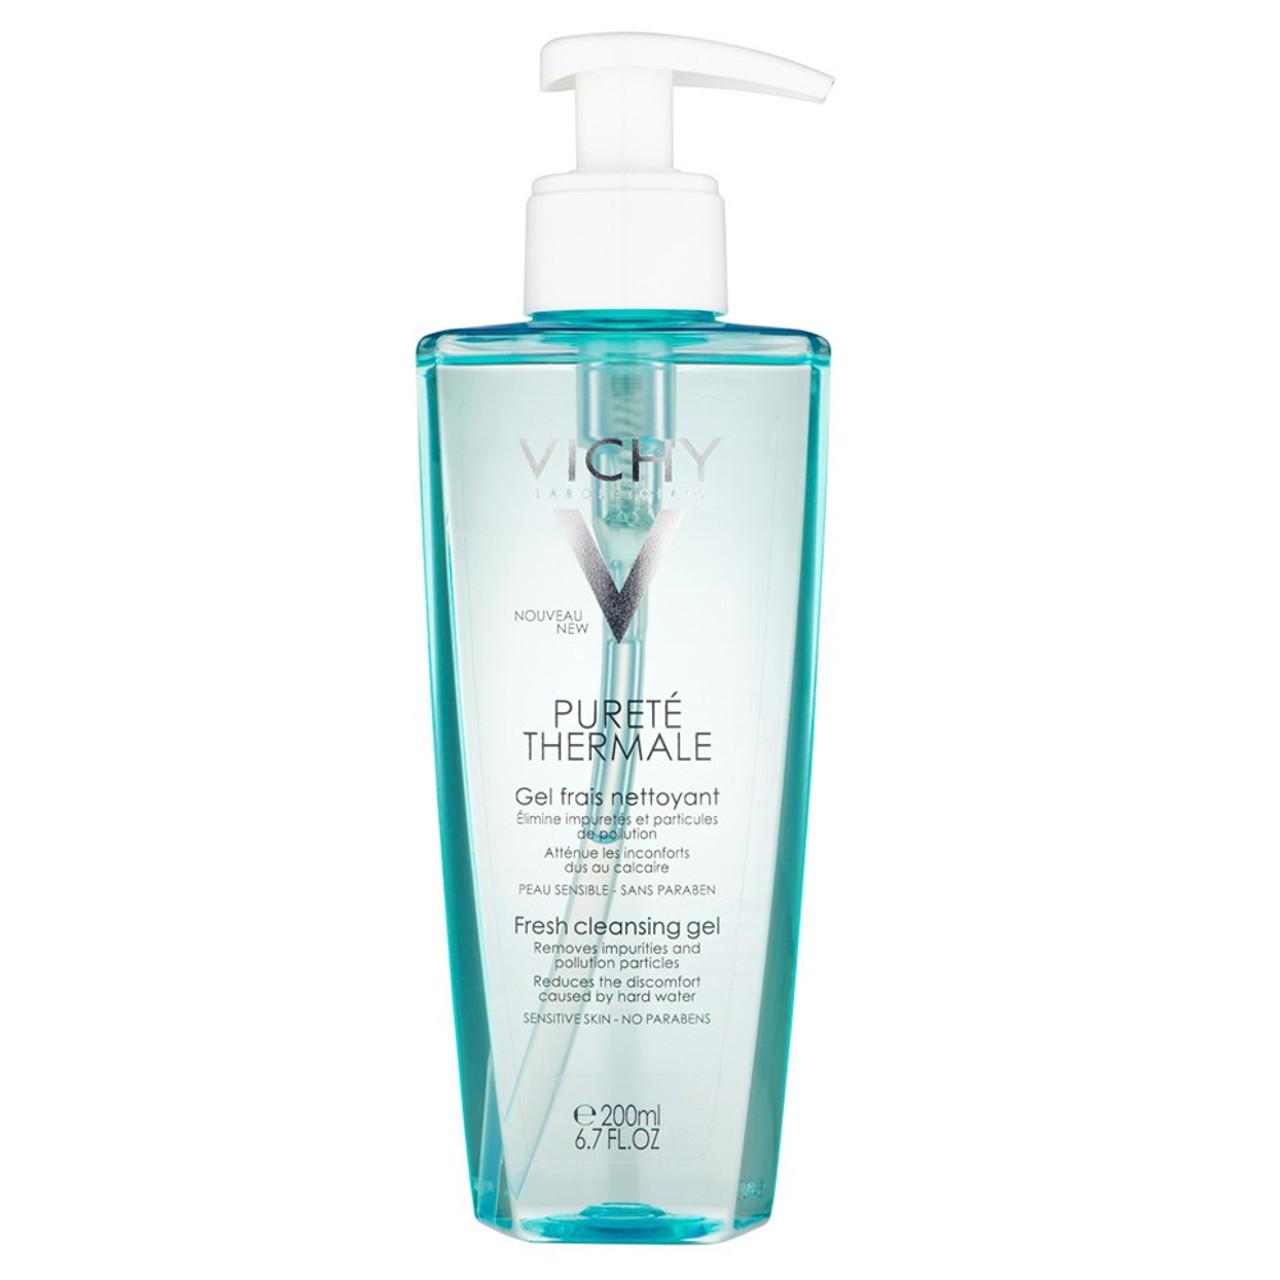 Vichy Purete Thermale Fresh Cleansing Gel BeautifiedYou.com